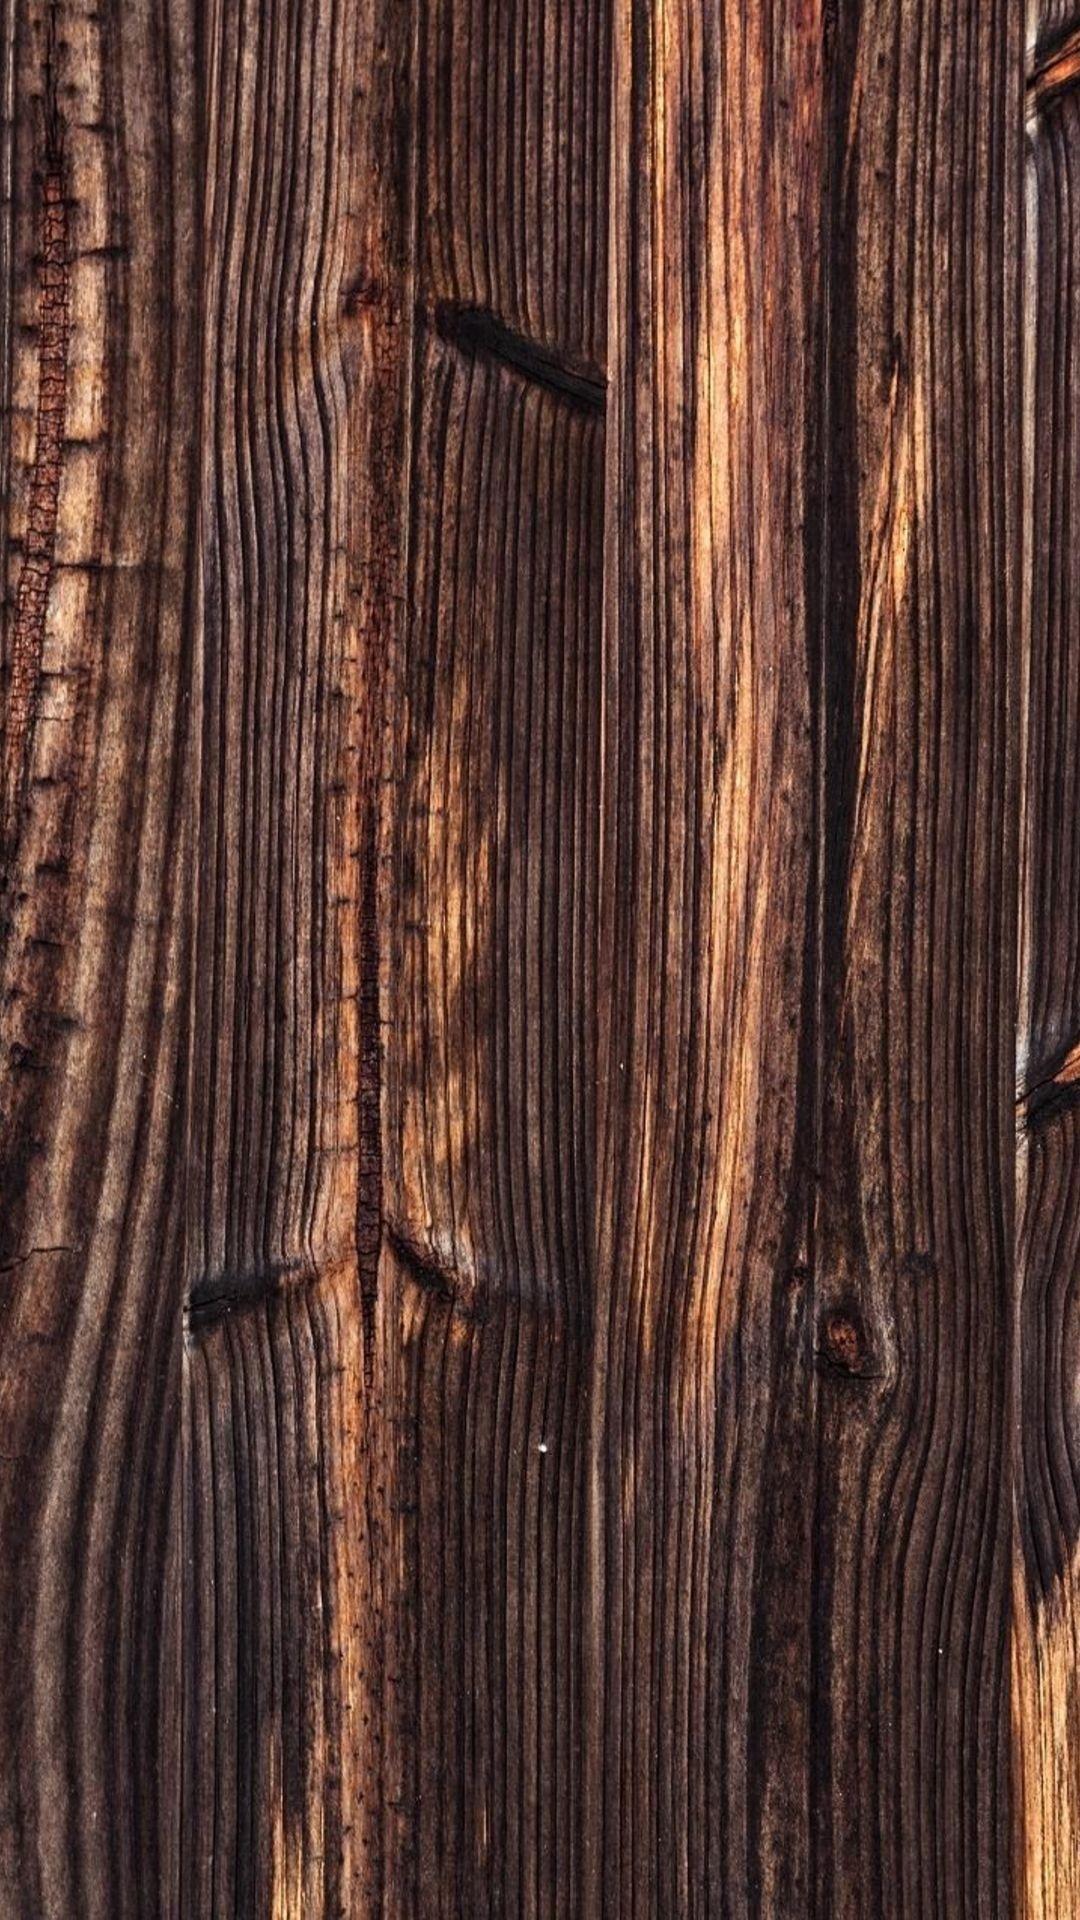 Wood iphone 8 wallpaper